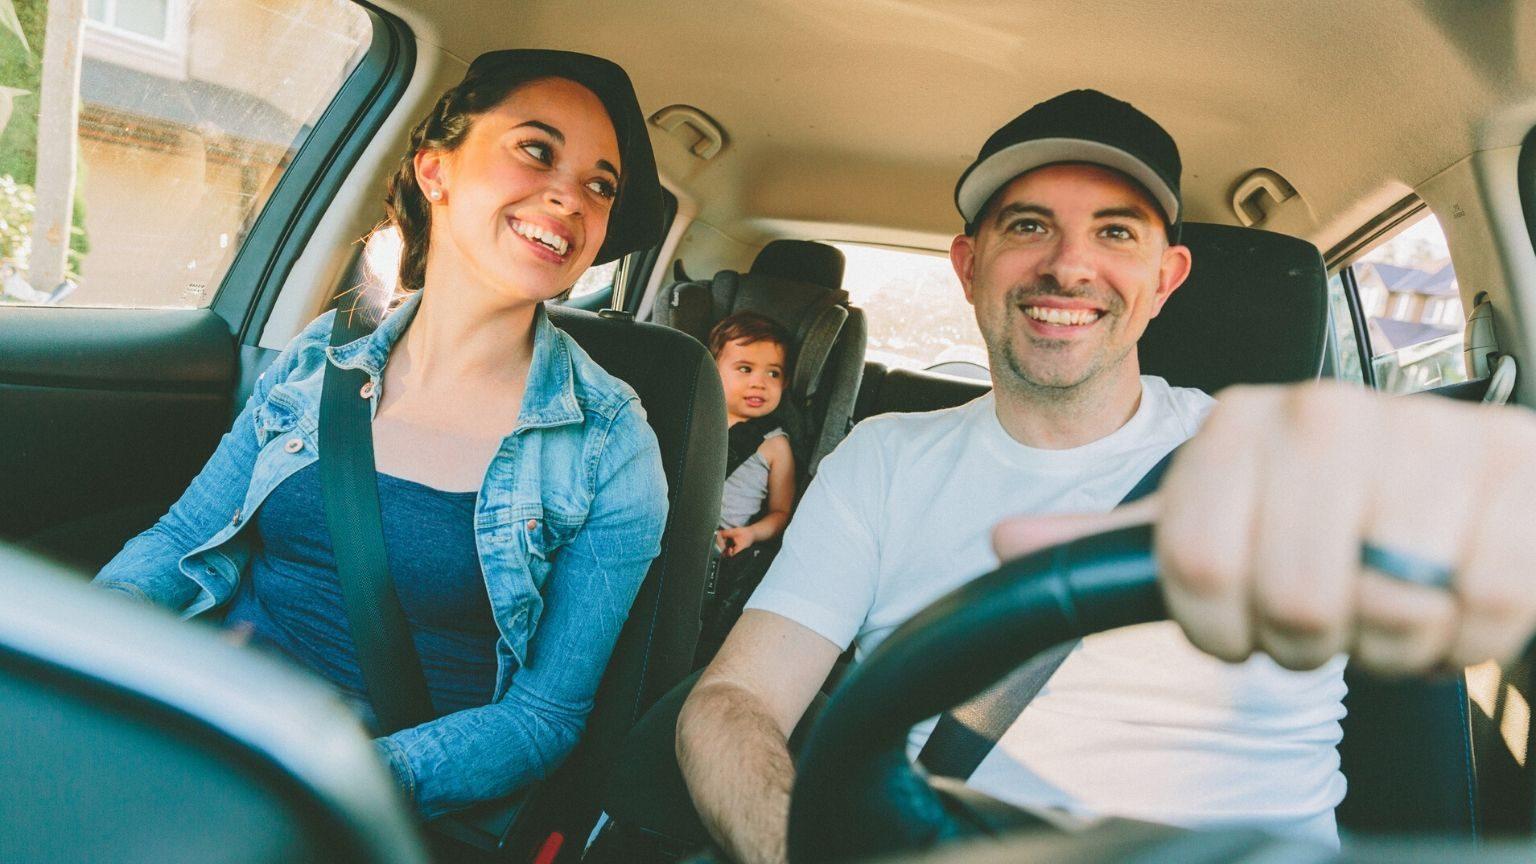 Family inside a car